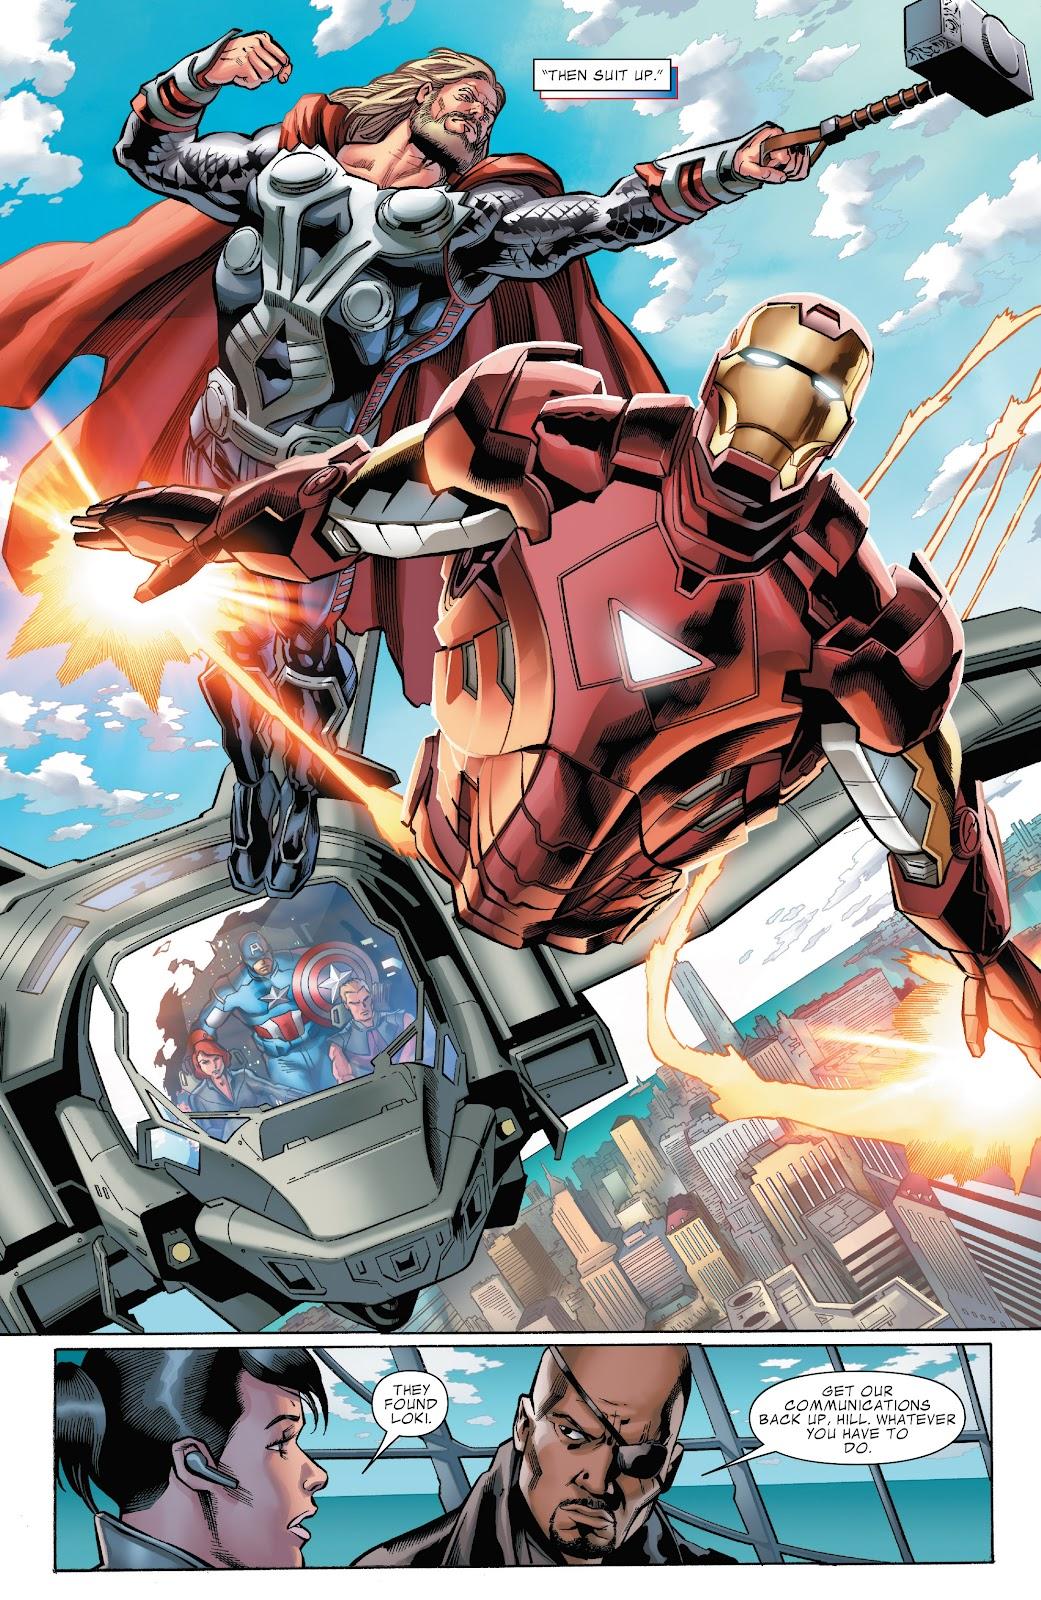 Read online Marvel's The Avengers comic -  Issue #2 - 8